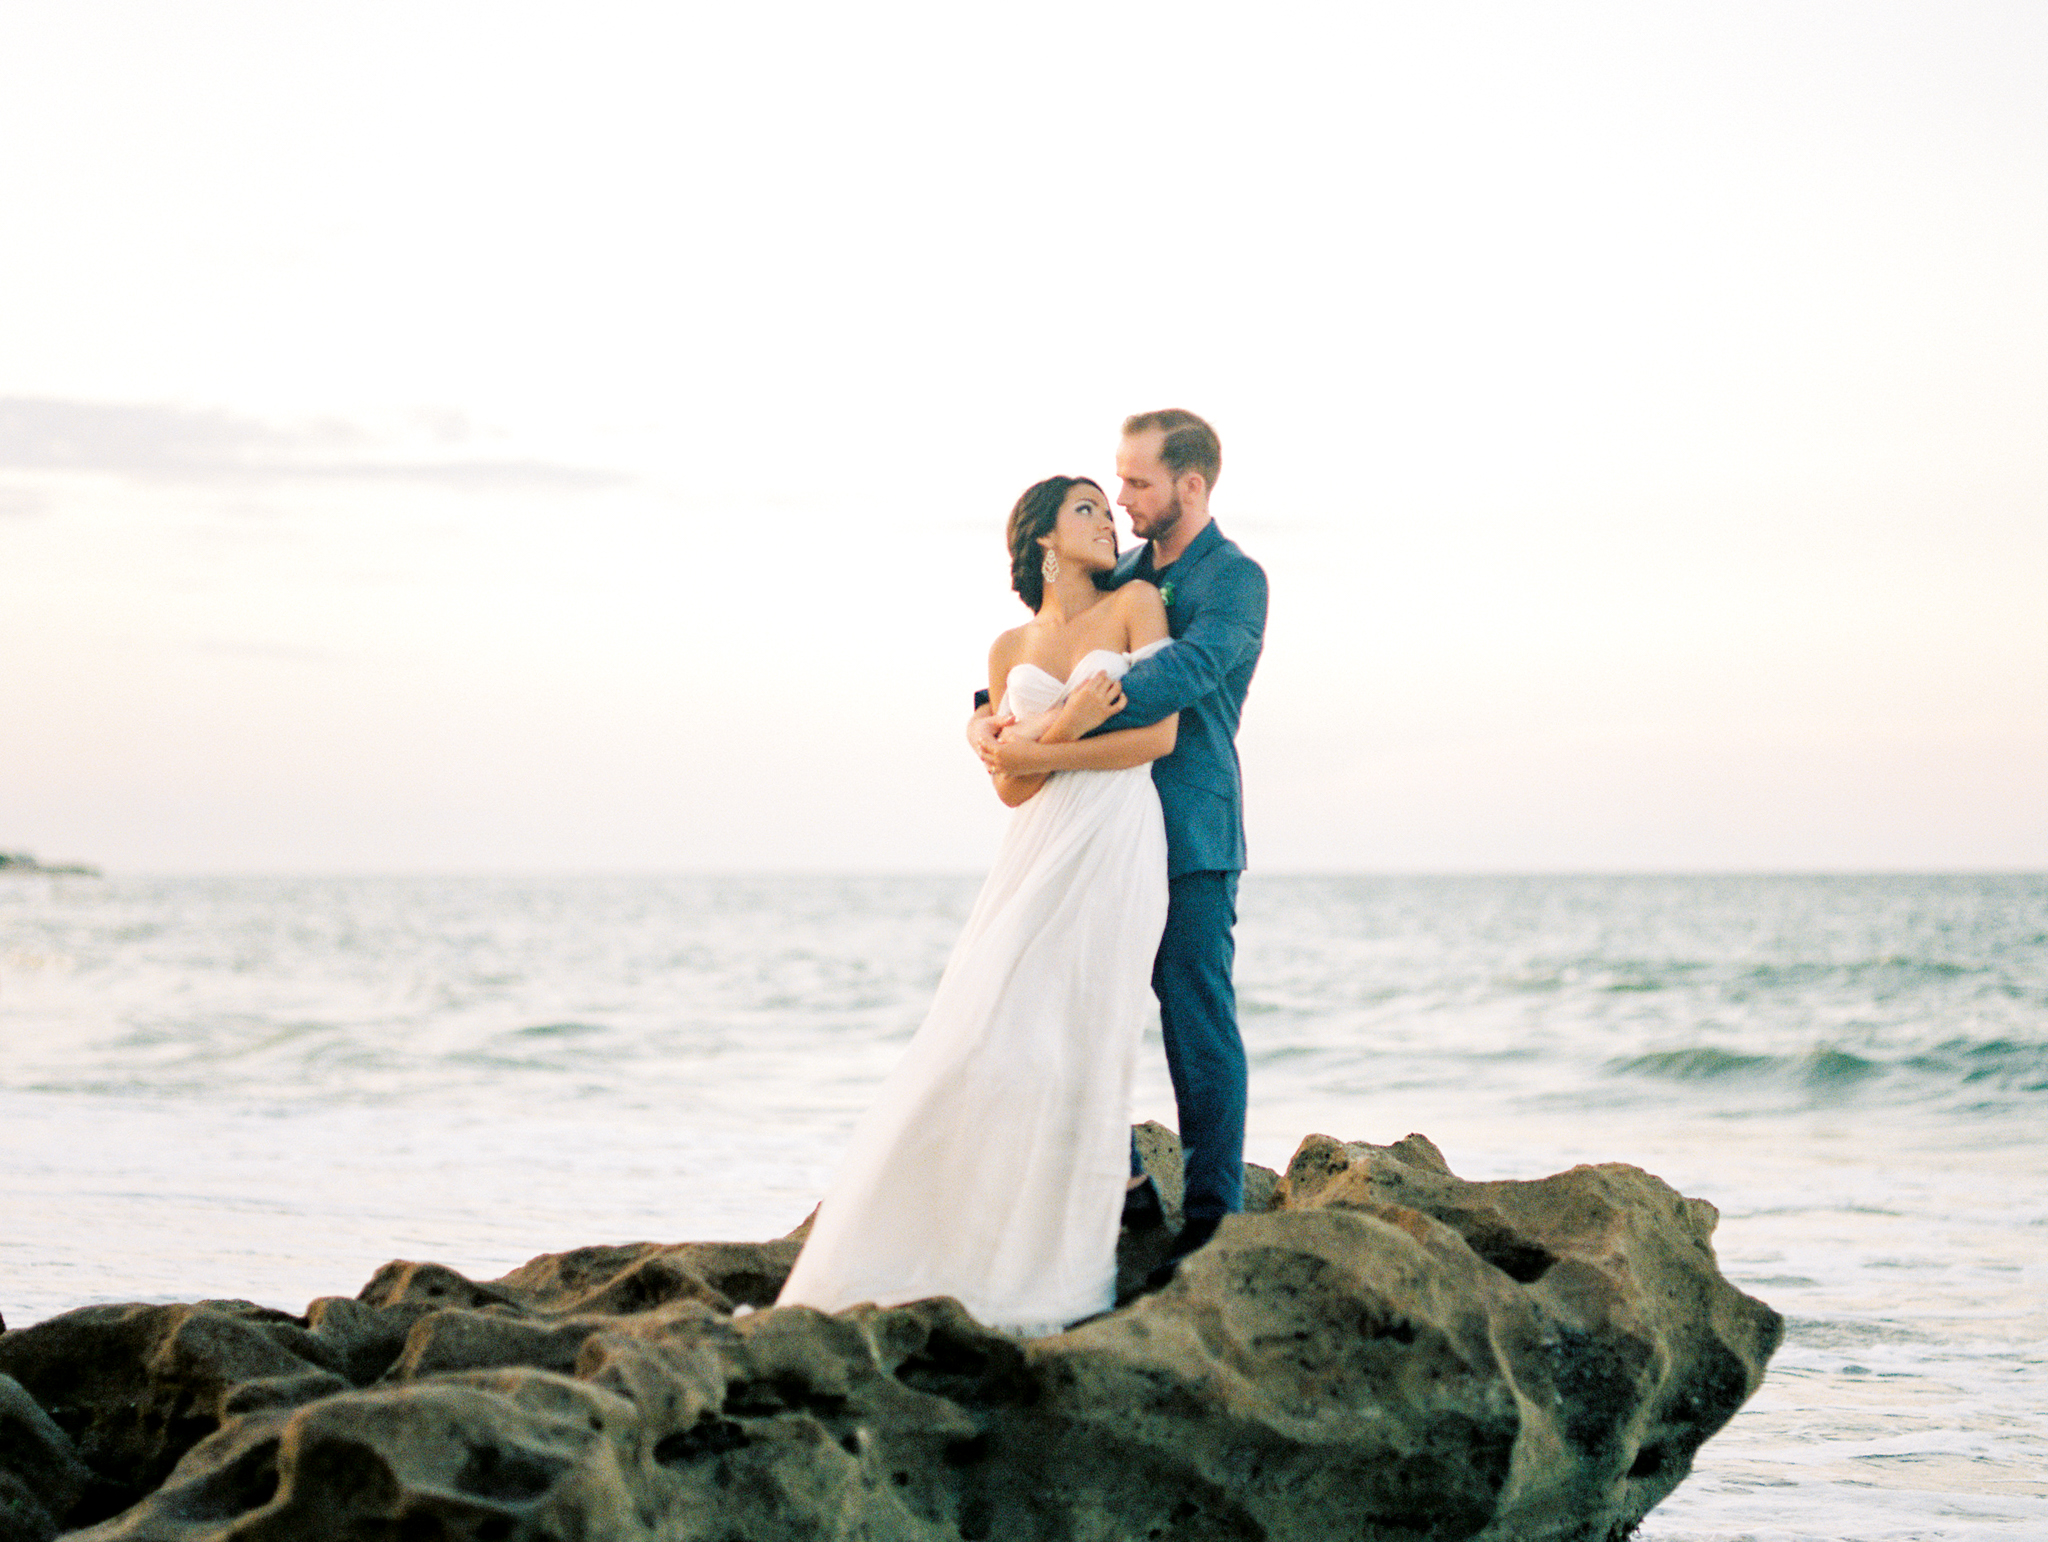 coral cove, jupiter beach FL, palm beach wedding photos, bride and groom on beach at sunset photos